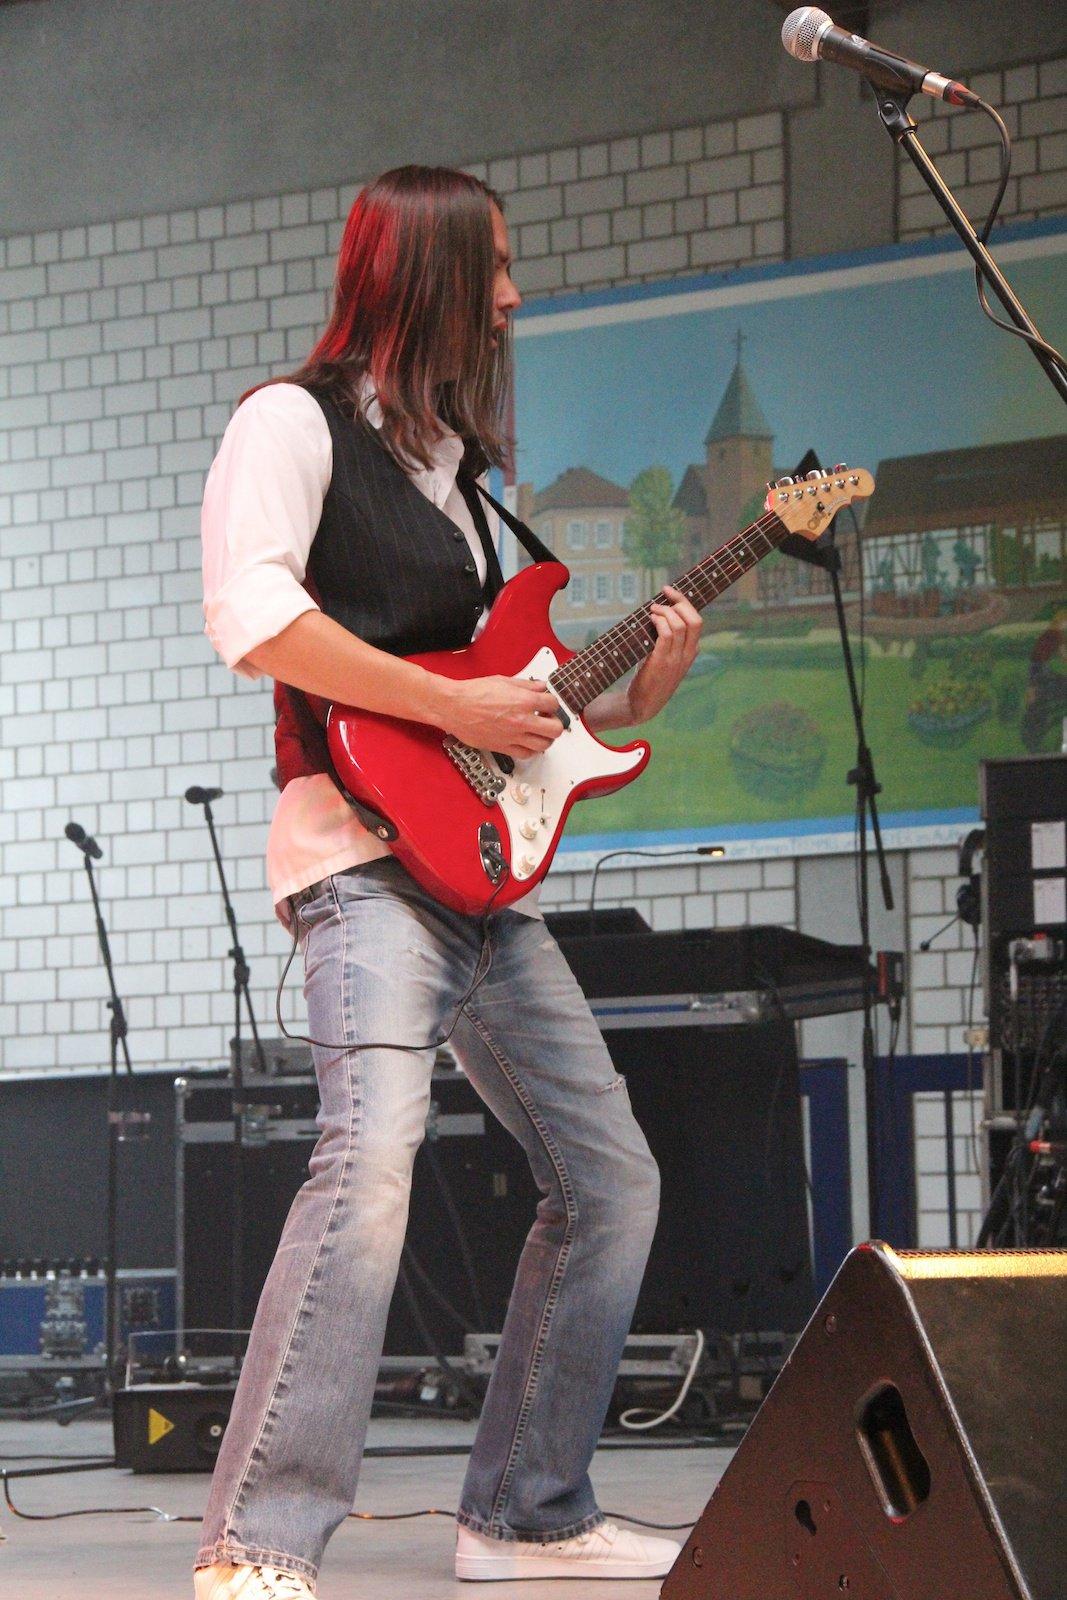 Stainless Quo - Sommerfesthalle, Otterstadt 18.06.2011 - 21